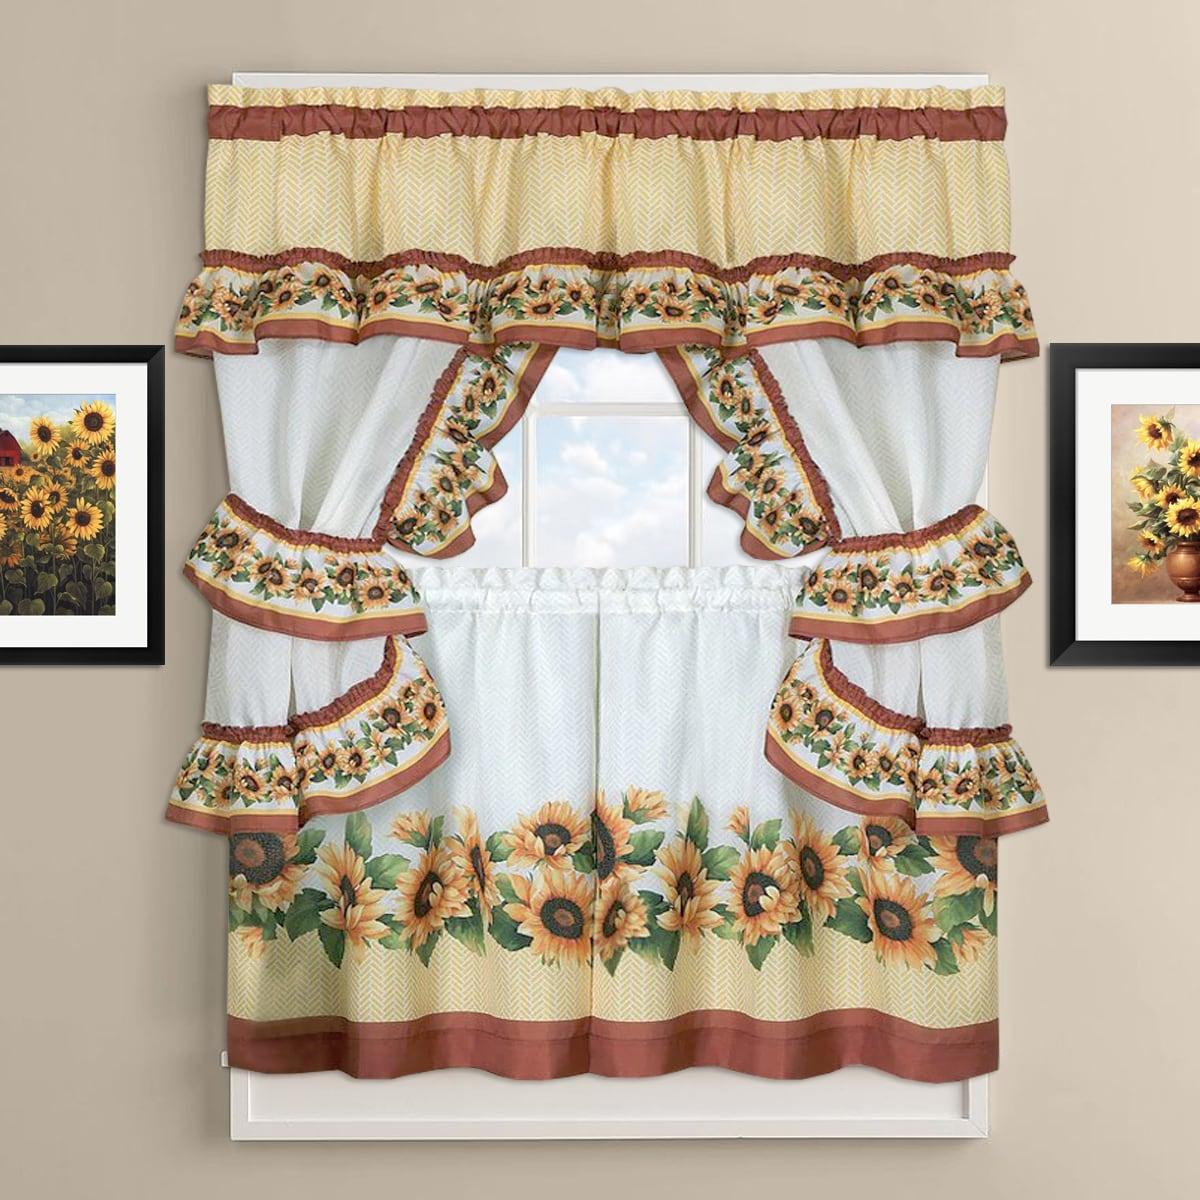 Sunflower Cottage Kitchen Curtain Tier and Valance Set (3...